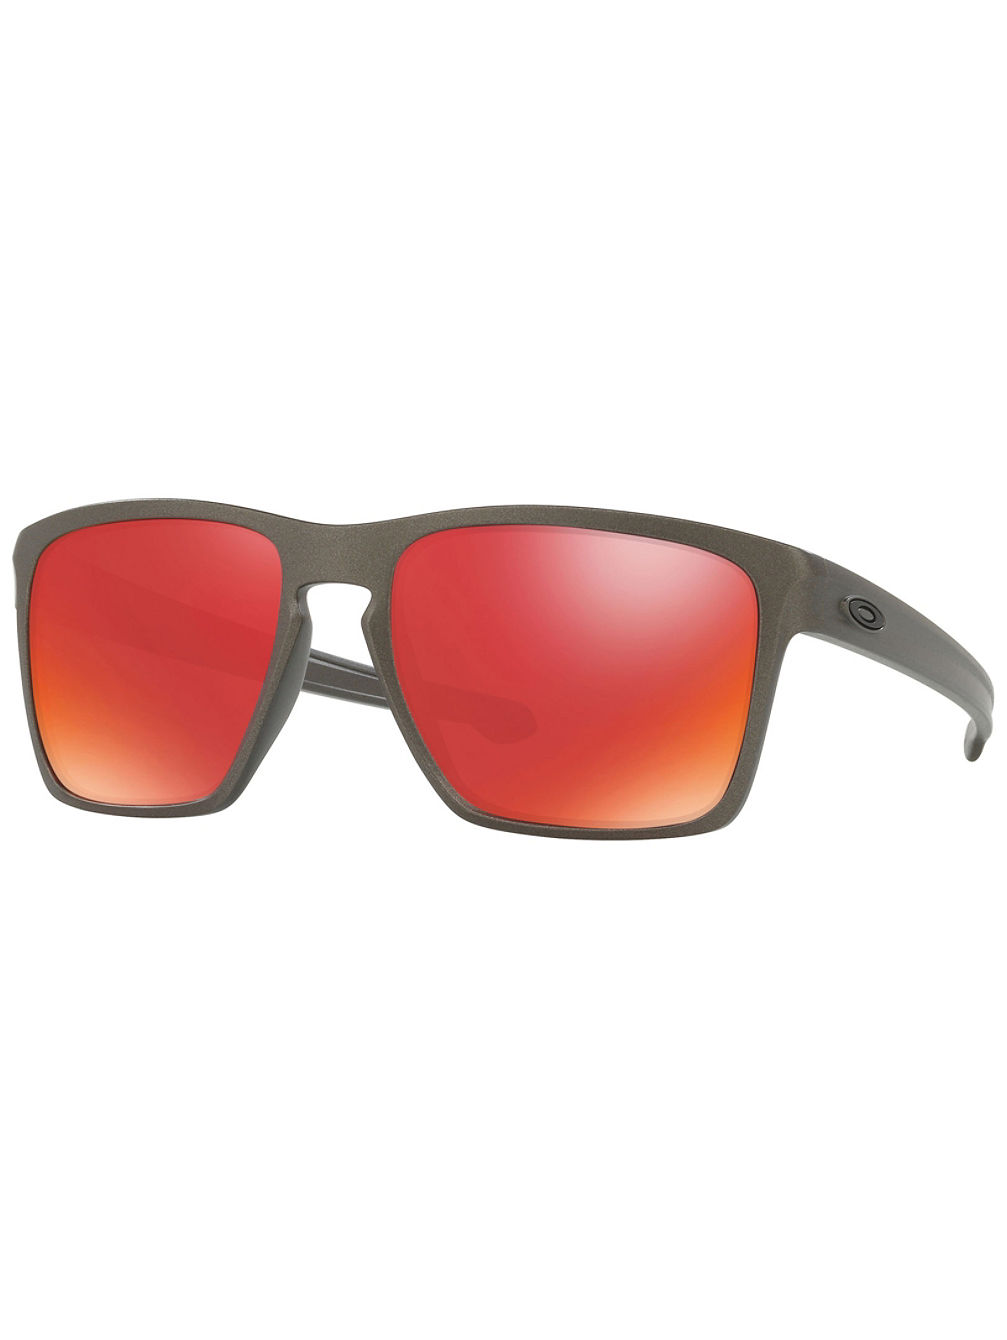 dc5fab3644fe0 Buy Oakley Sliver Sliver Xl Lead online at Blue Tomato